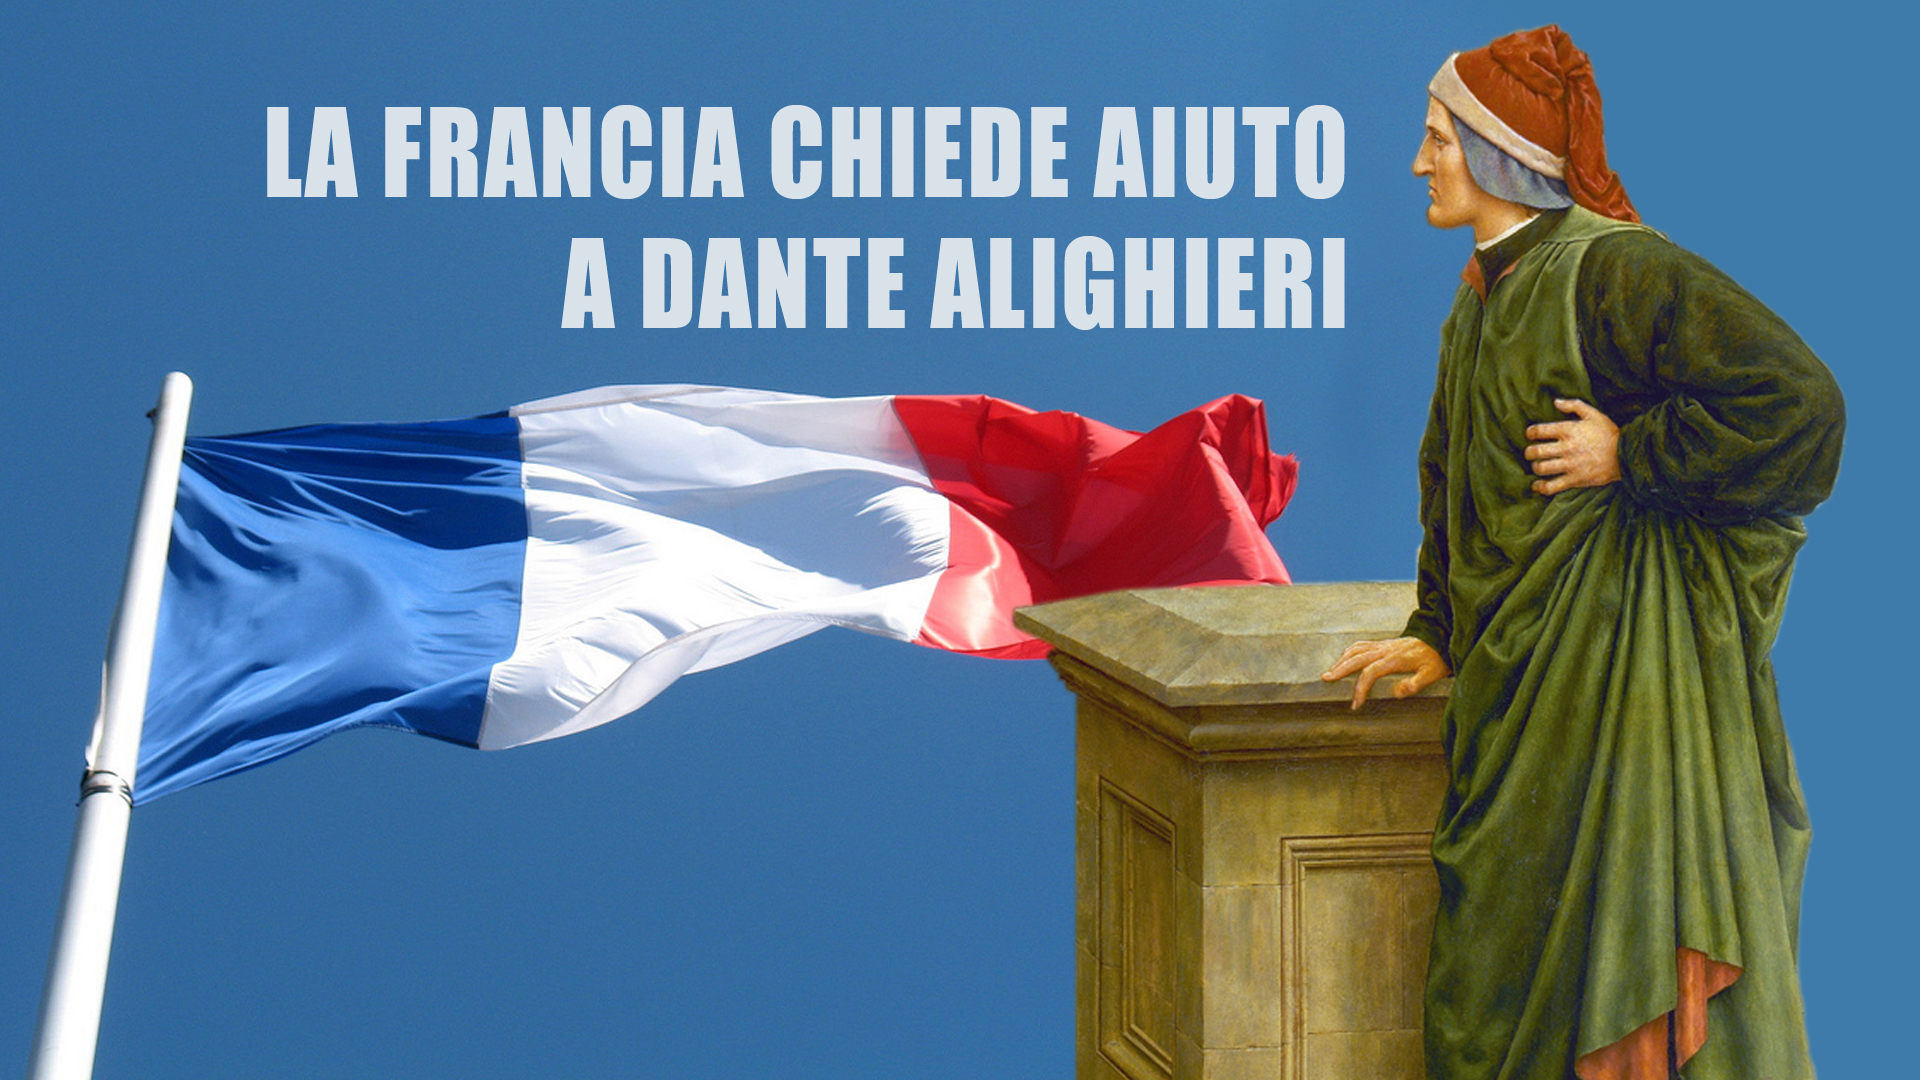 Settantaseiesima puntata. I francesi riscoprono Dante Alighieri